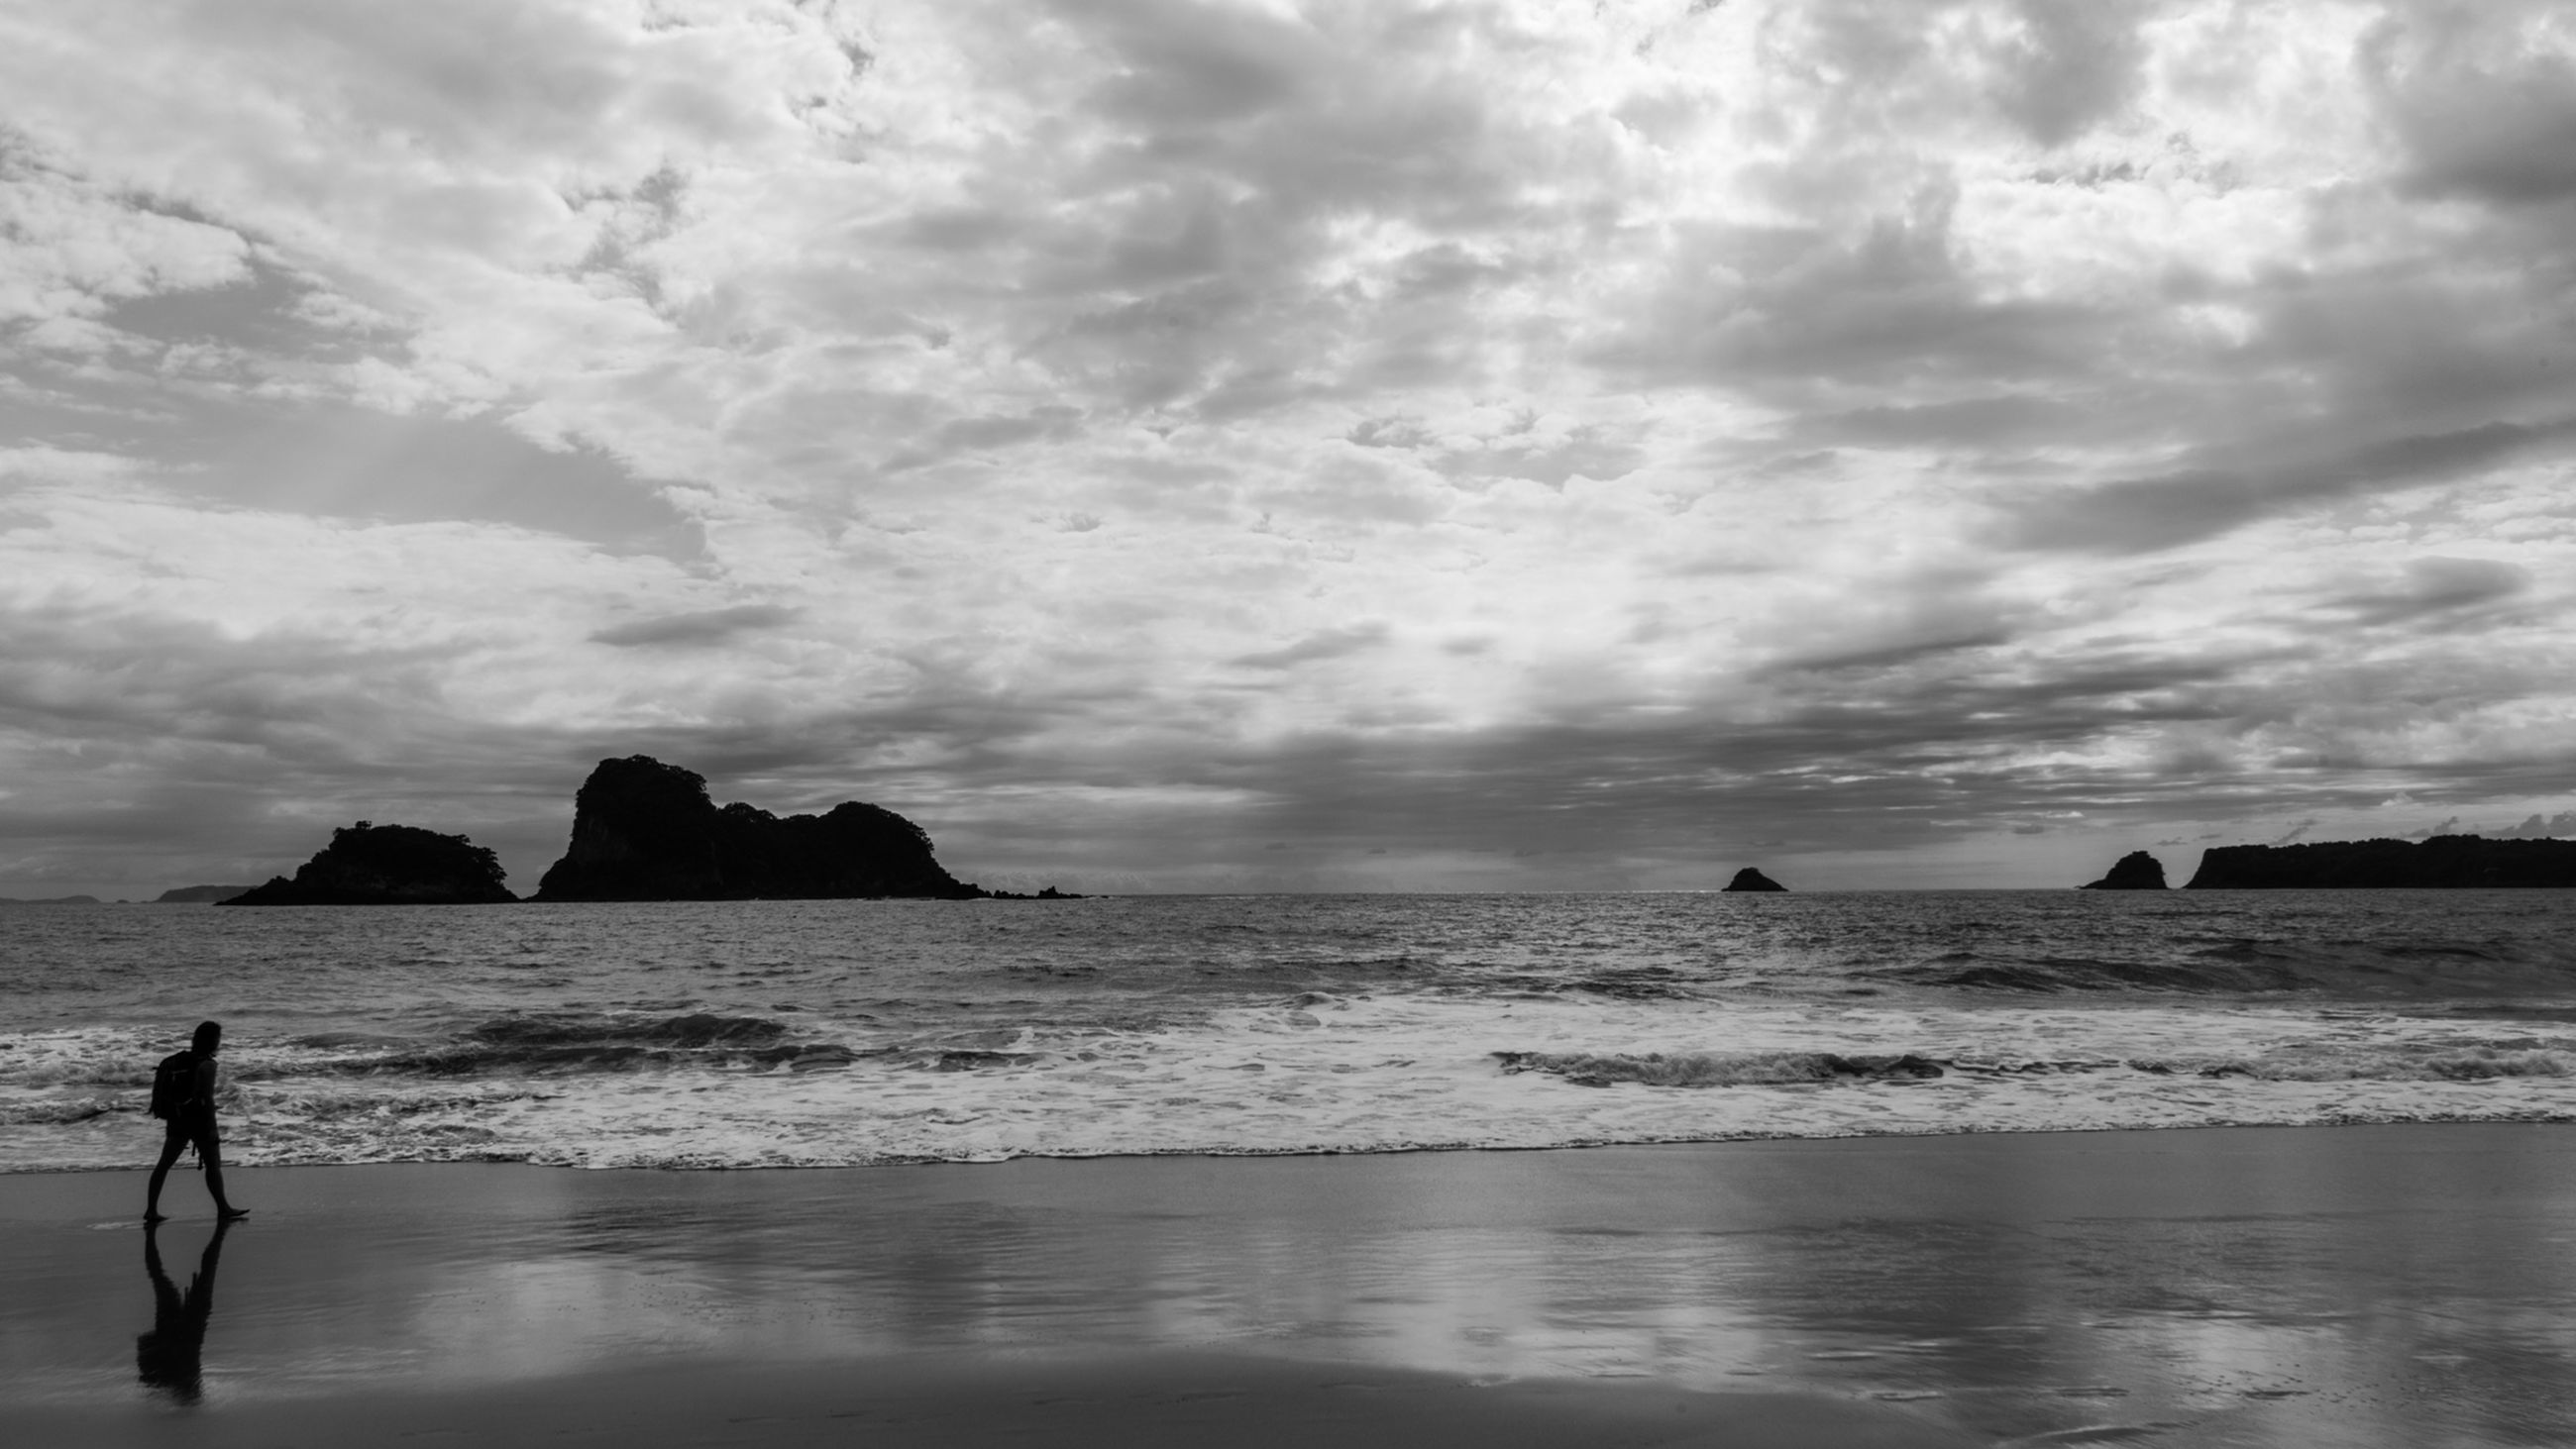 Silhouette man walking on beach against sky at dusk